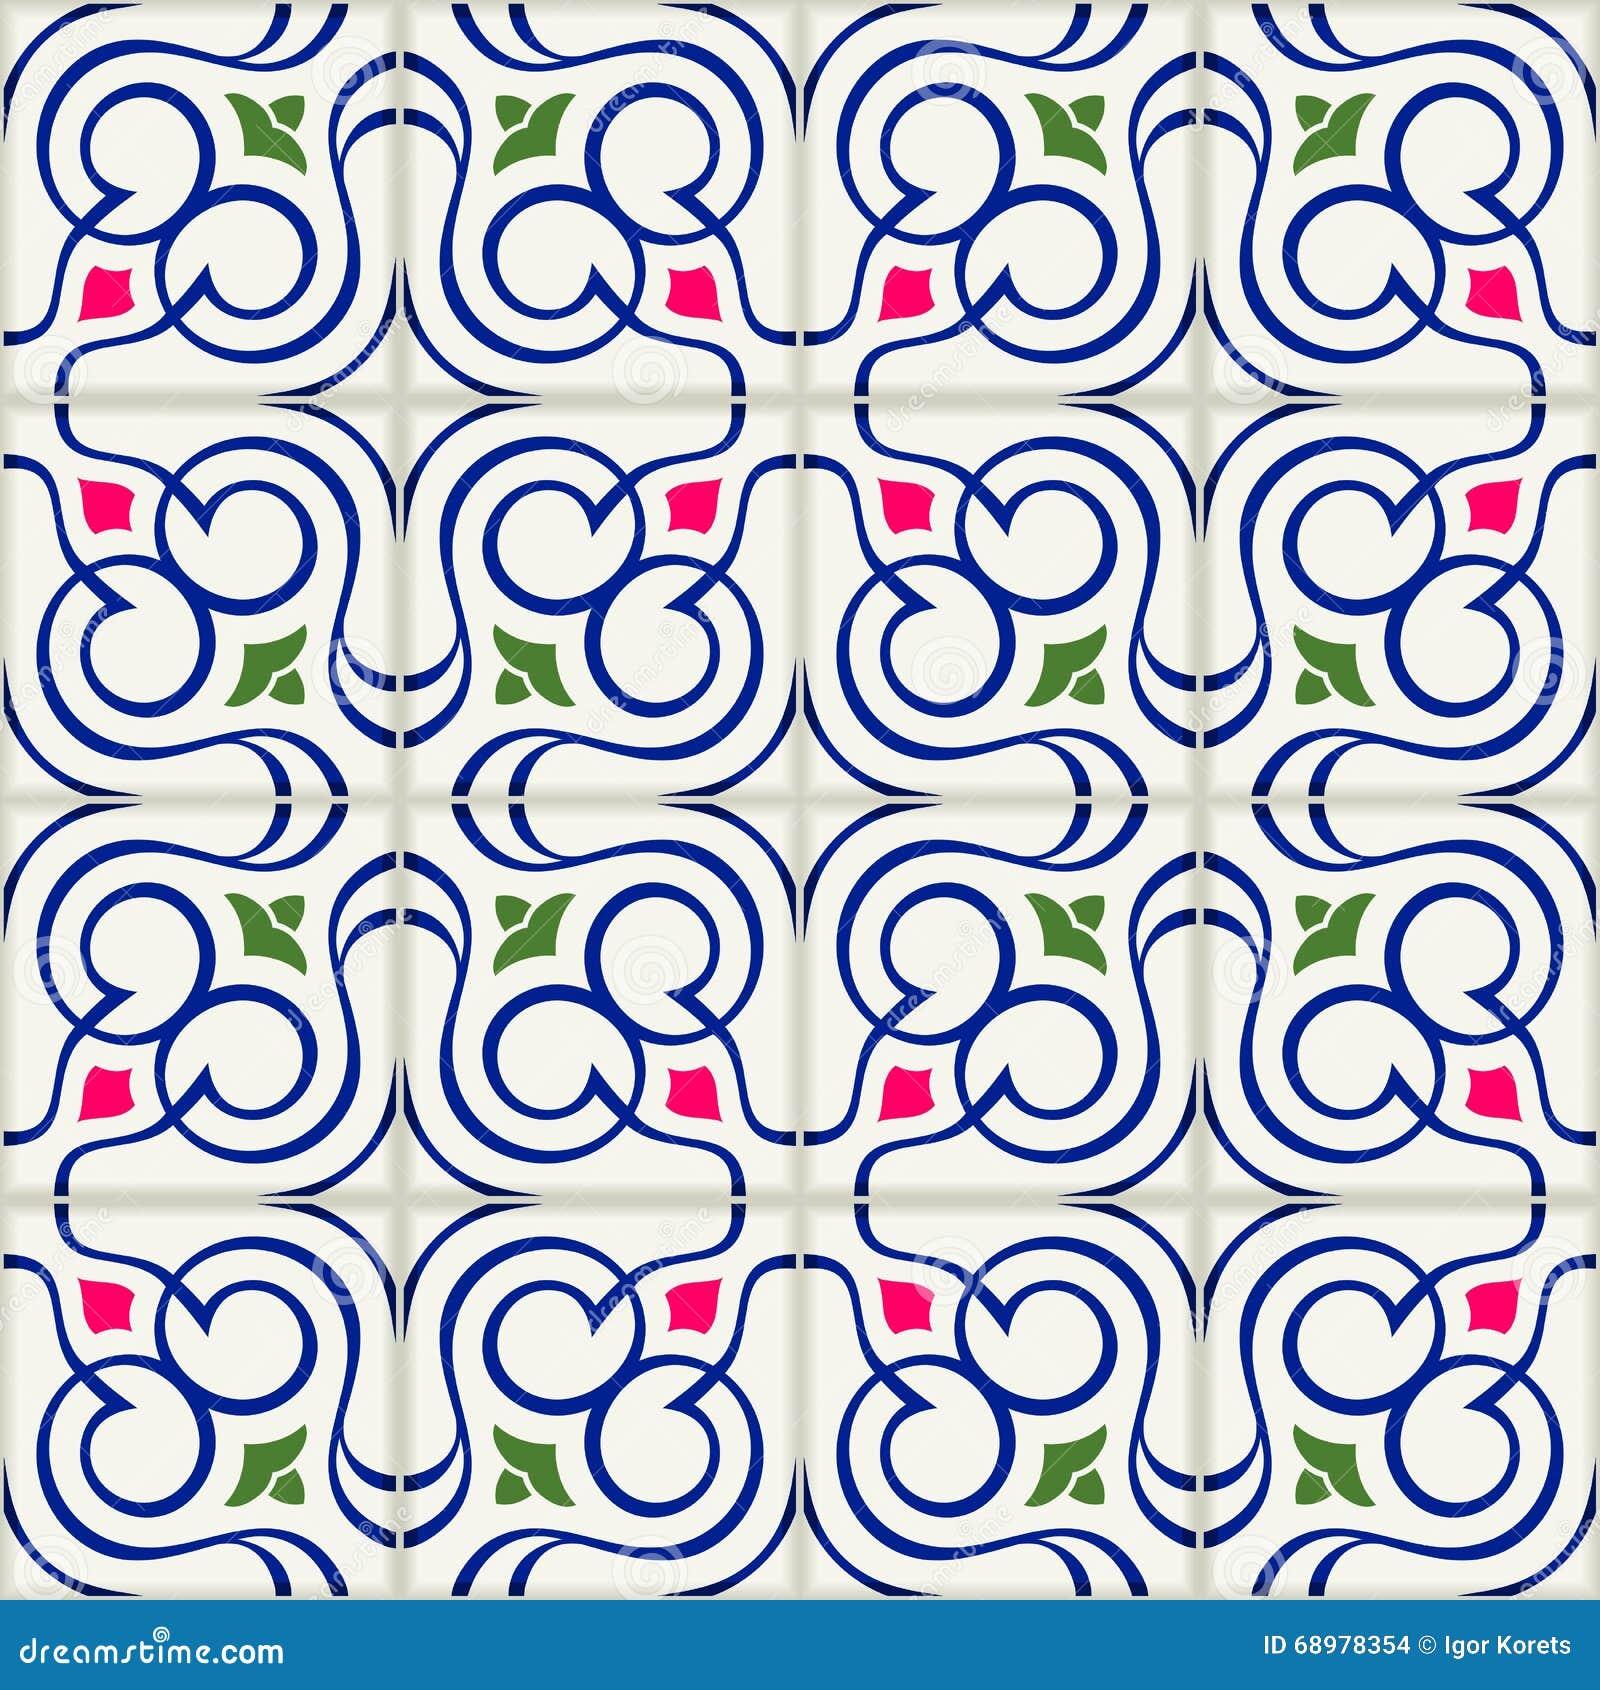 Tejas turcas del modelo inconsútil magnífico, marroquíes, portuguesas blancas, Azulejo, ornamento árabe Arte islámico